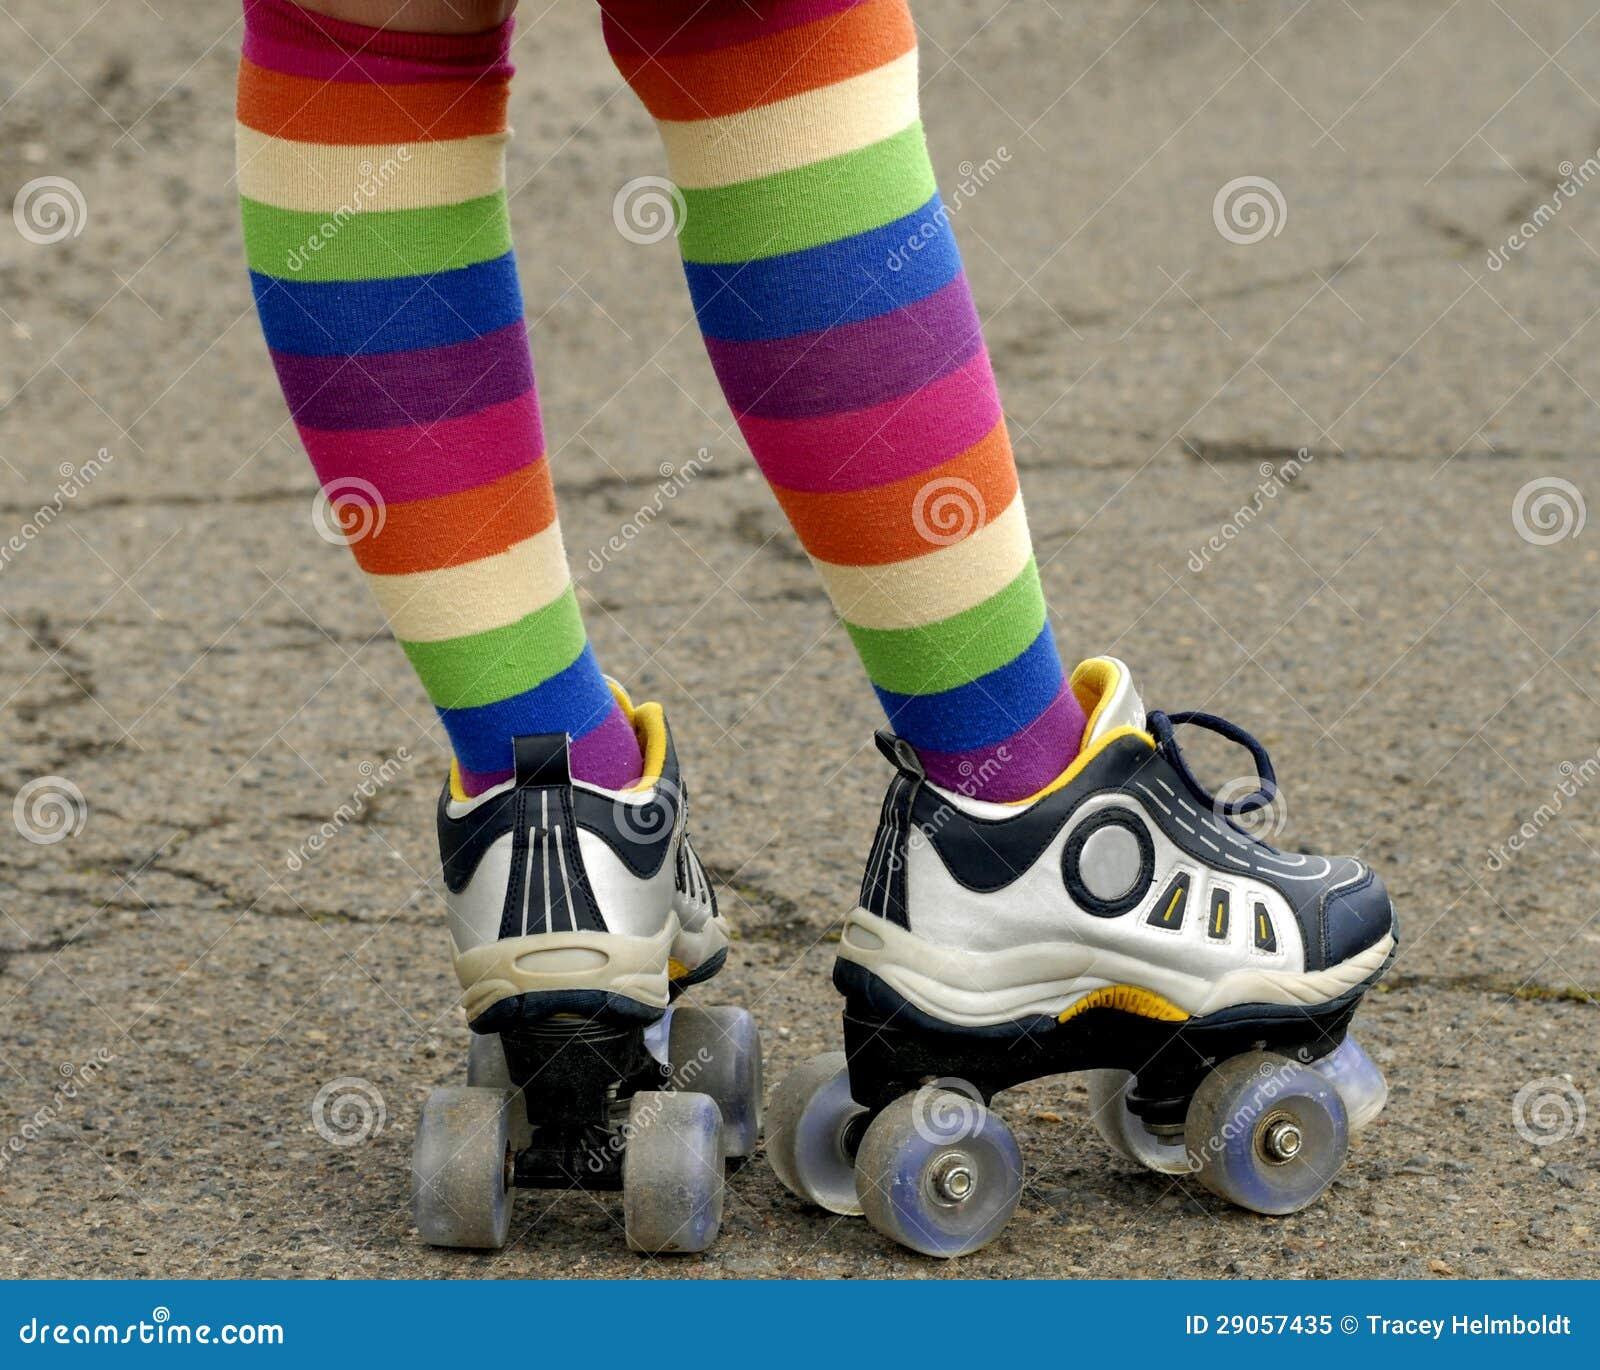 Roller skates for free - Colorful Socks And Roller Skates